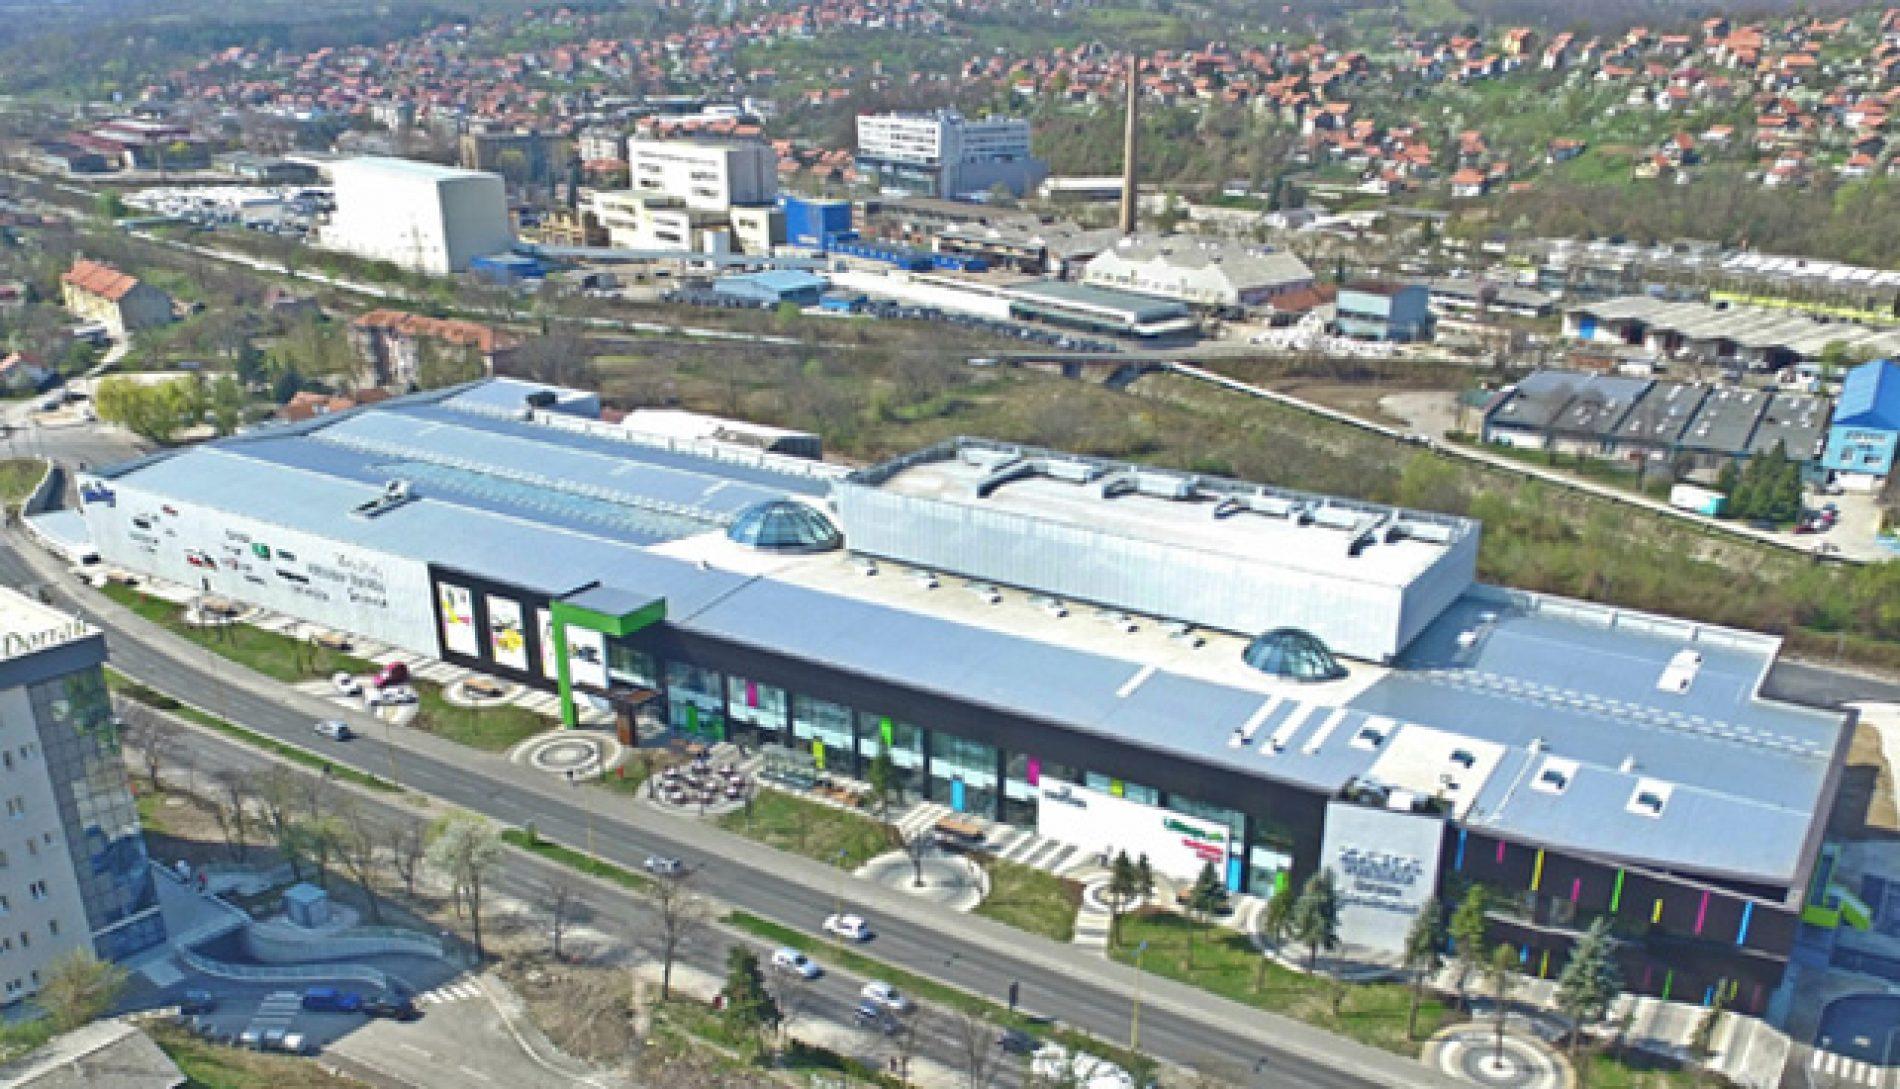 Bosanski građevinski div: Uspjeh iz prošle godine kompanija Širbegović Inženjering nastavlja i u 2017.